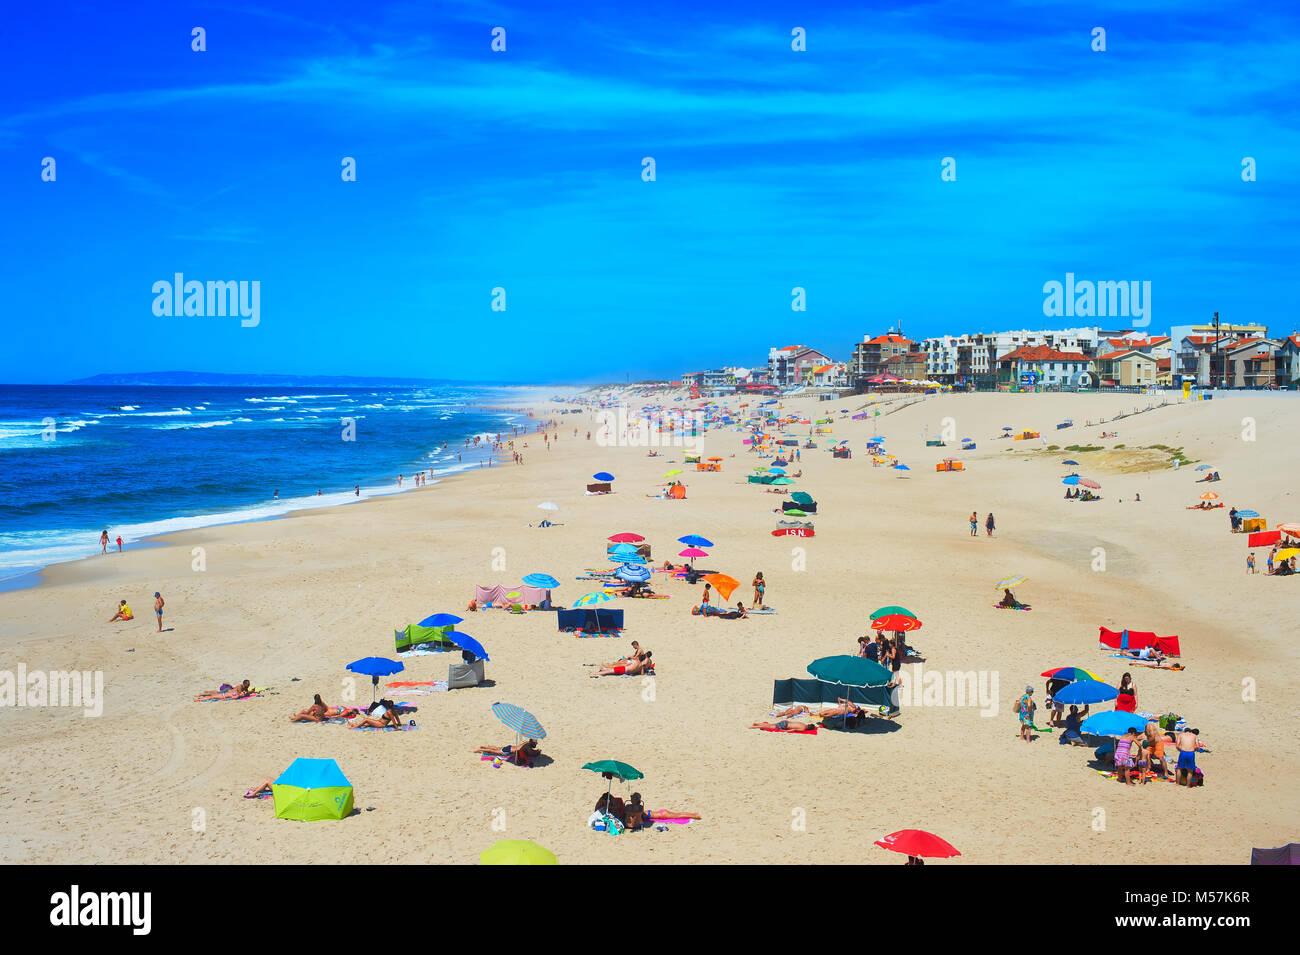 ESPINHO, PORTUGAL - May 30, 2017: Menschen am Ocean Beach in einer hohen Peak Season. Portugal berühmten Reiseziel Stockbild